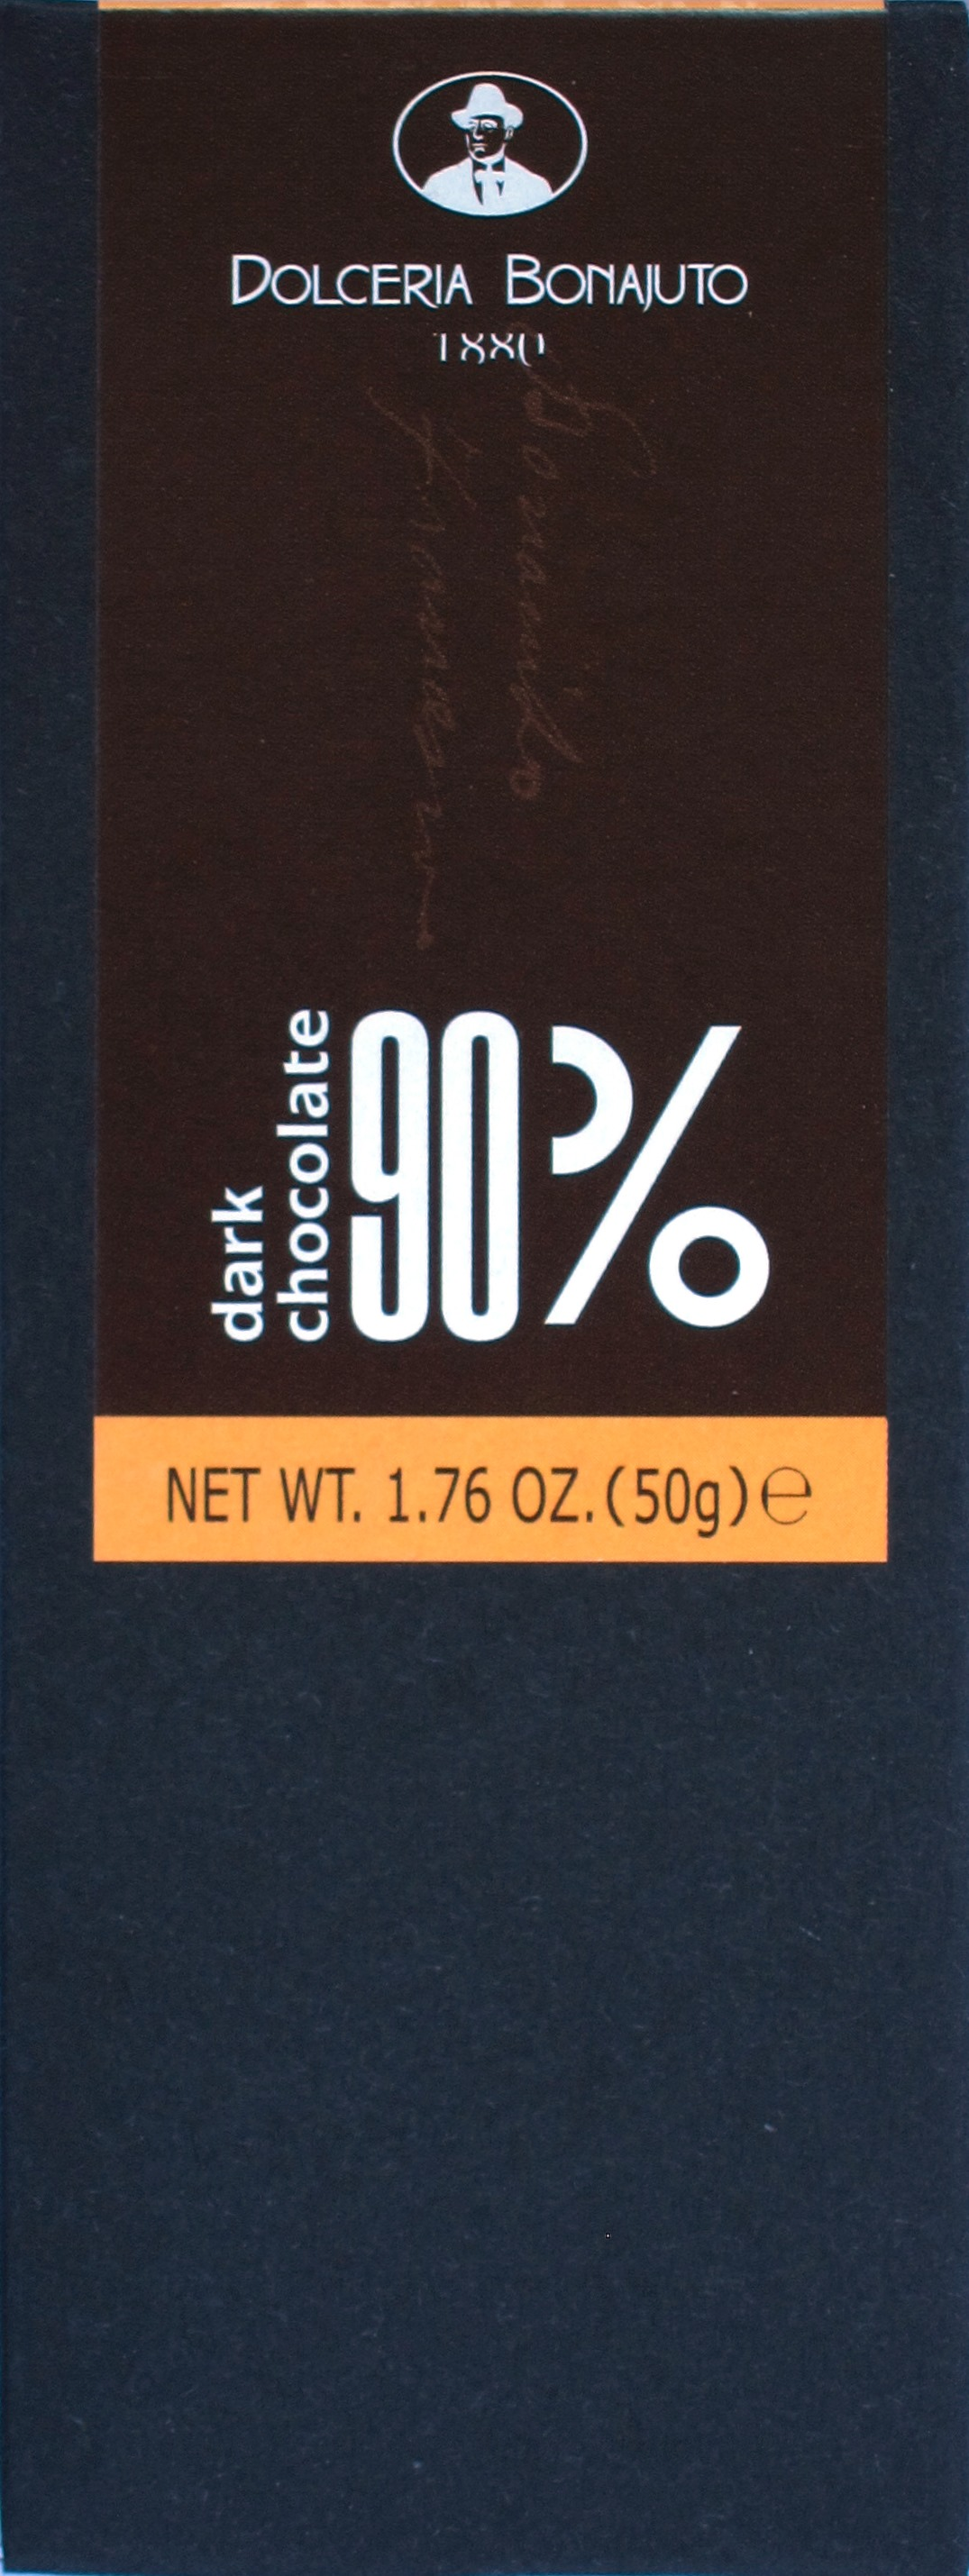 Antica Dolceria Bonajuto, 90%-Bitterschokolade